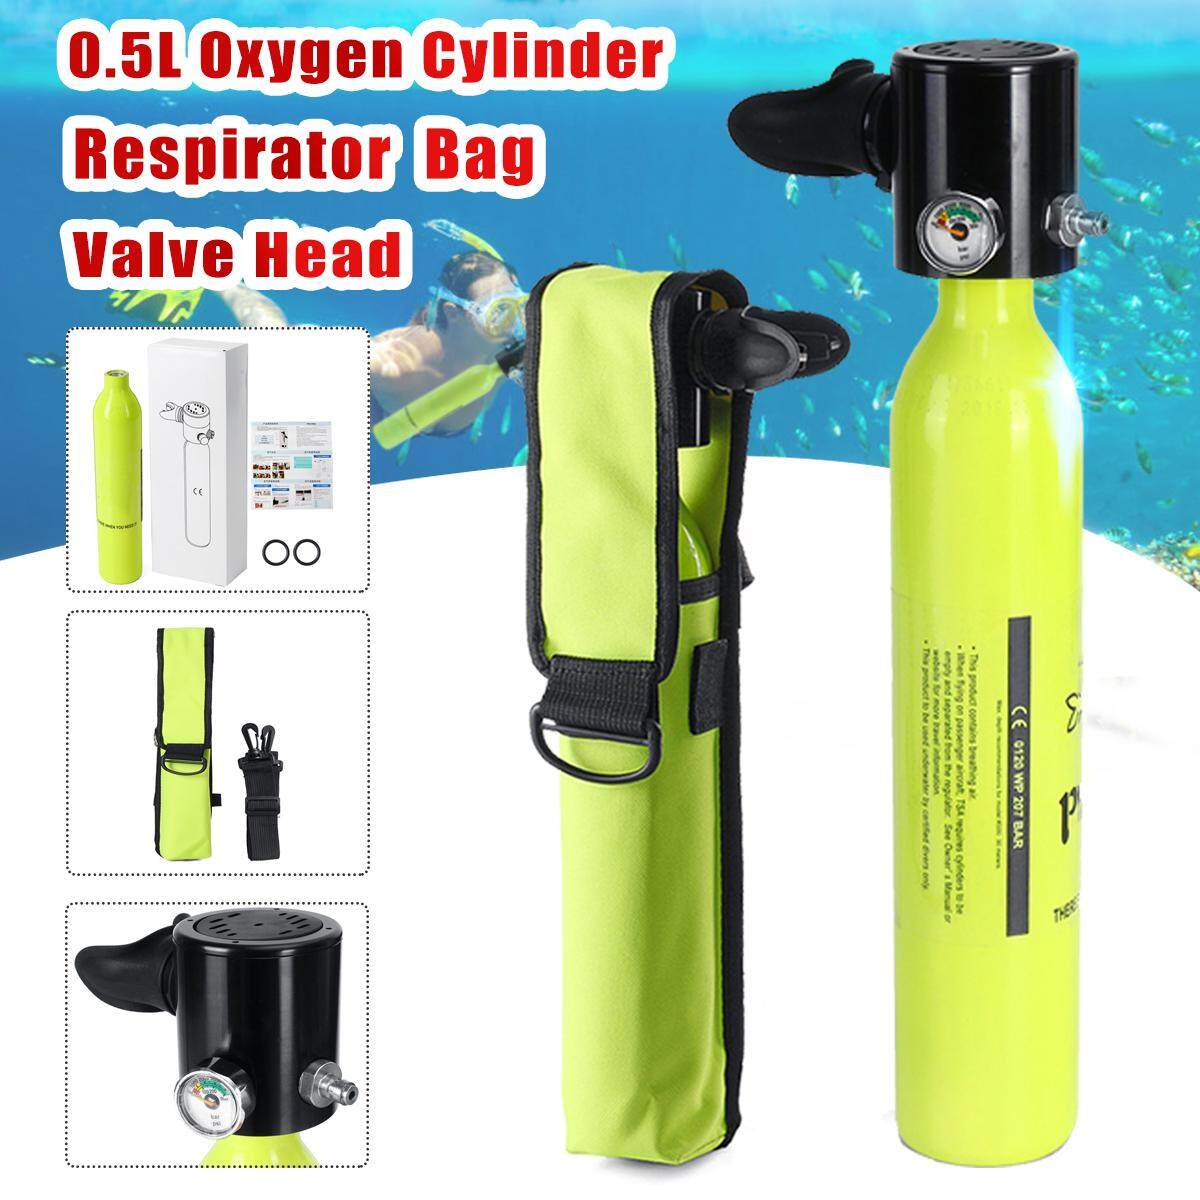 Surfing & Diving Mini Swimming Scuba Diving Oxygen Cylinder Tank Bag Holder Respirator Bag Scuba Diving Pool Equipment Accessory